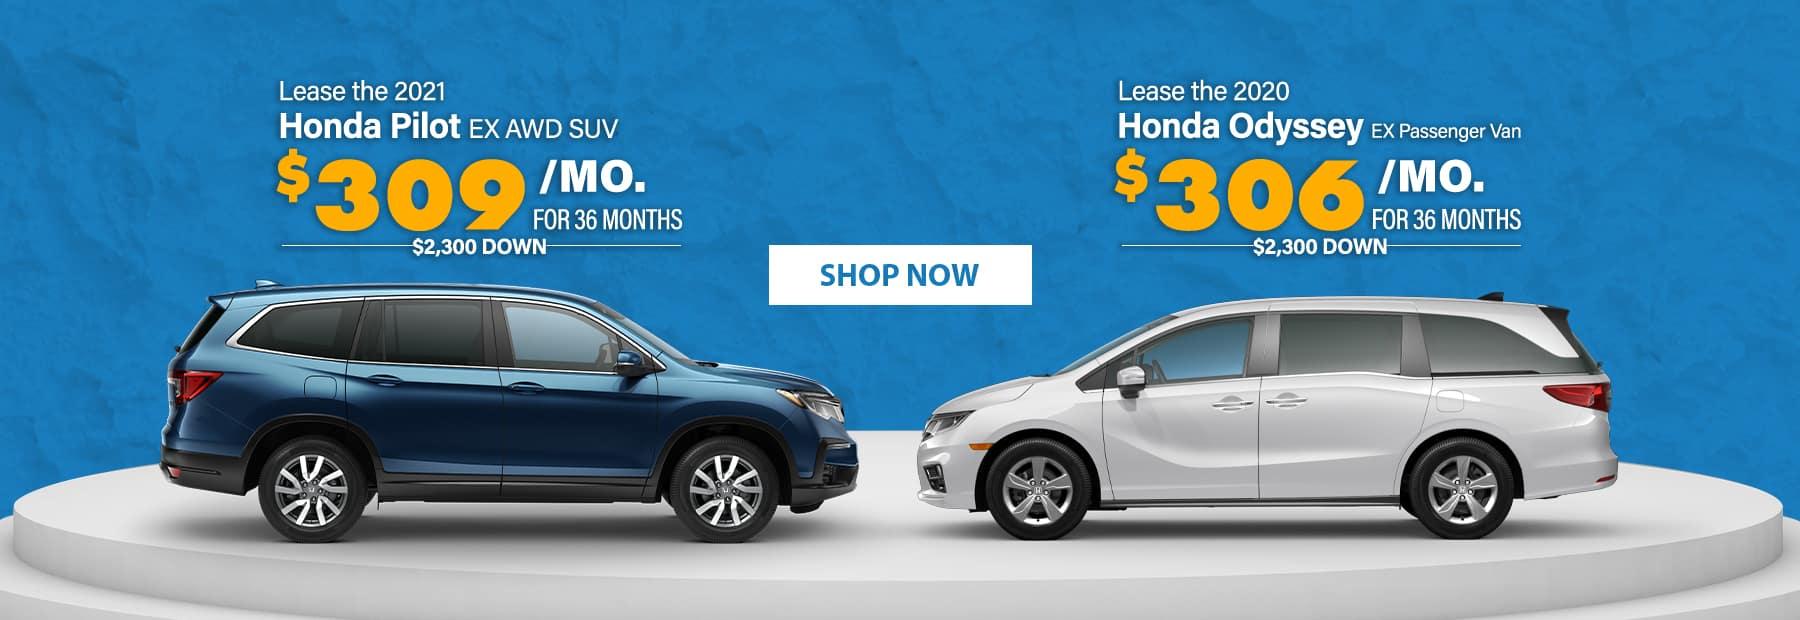 Lease a 2021 Honda Pilot EX AWD SUV or Lease a 2020 Honda Odyssey EX Passenger Van